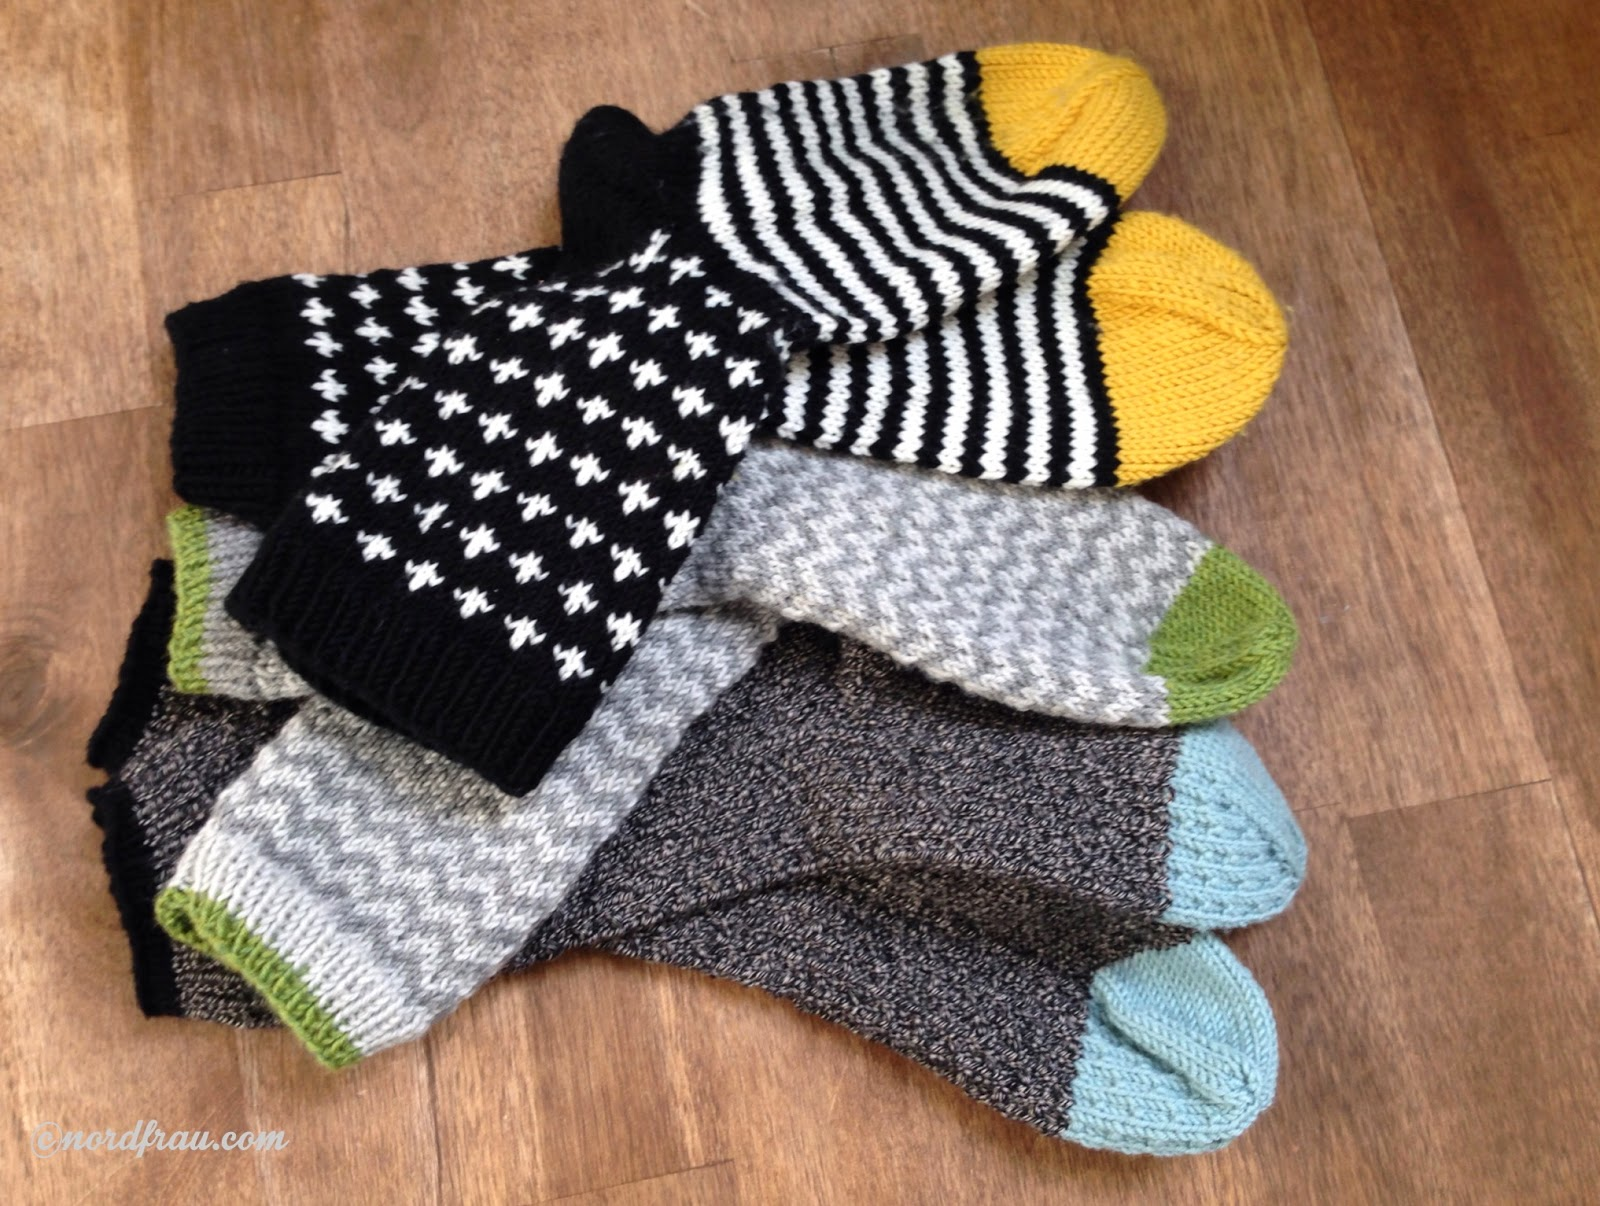 drei Paar gestrickte Socken